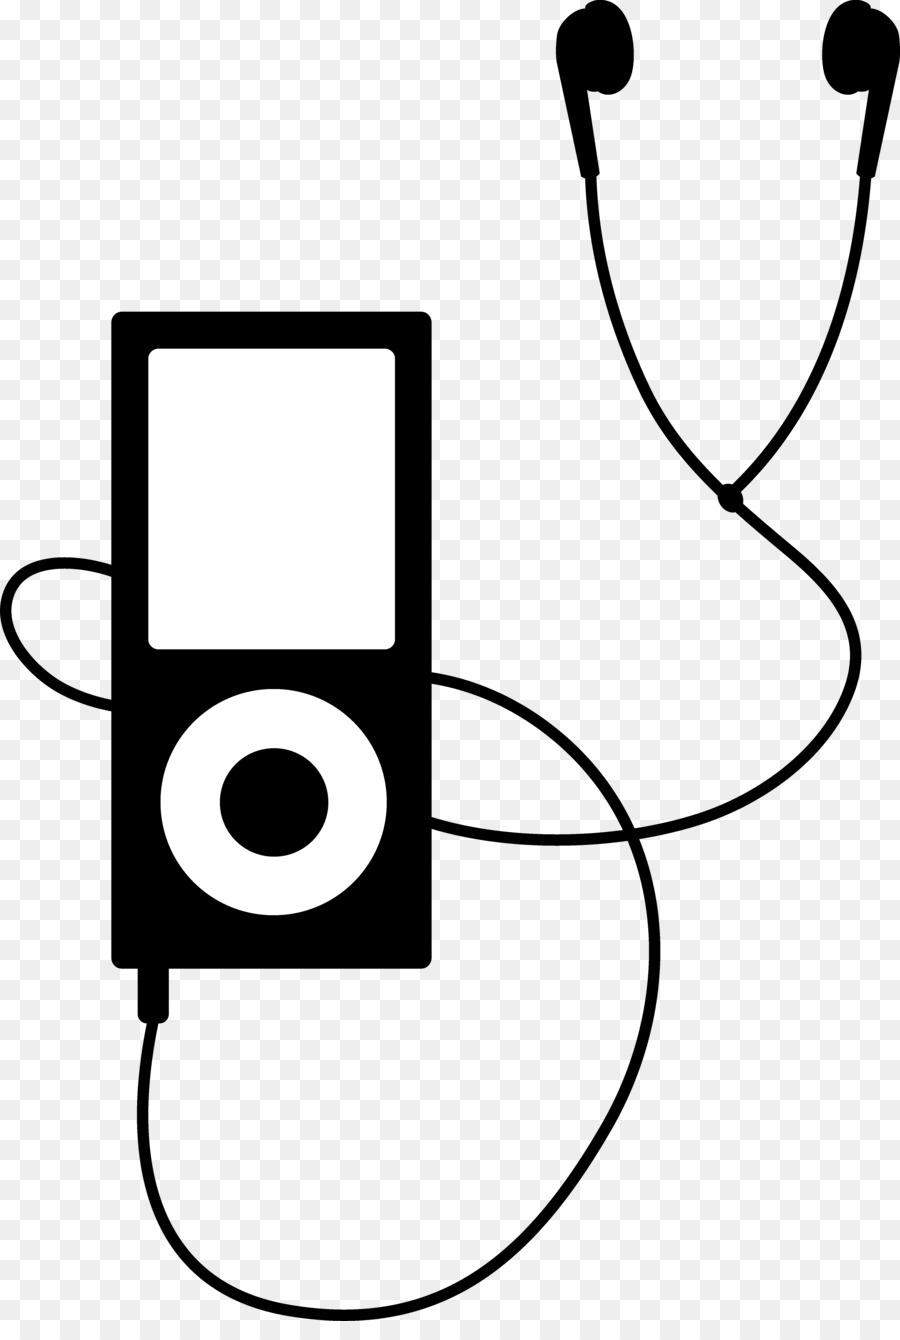 Headphones Cartoon clipart.